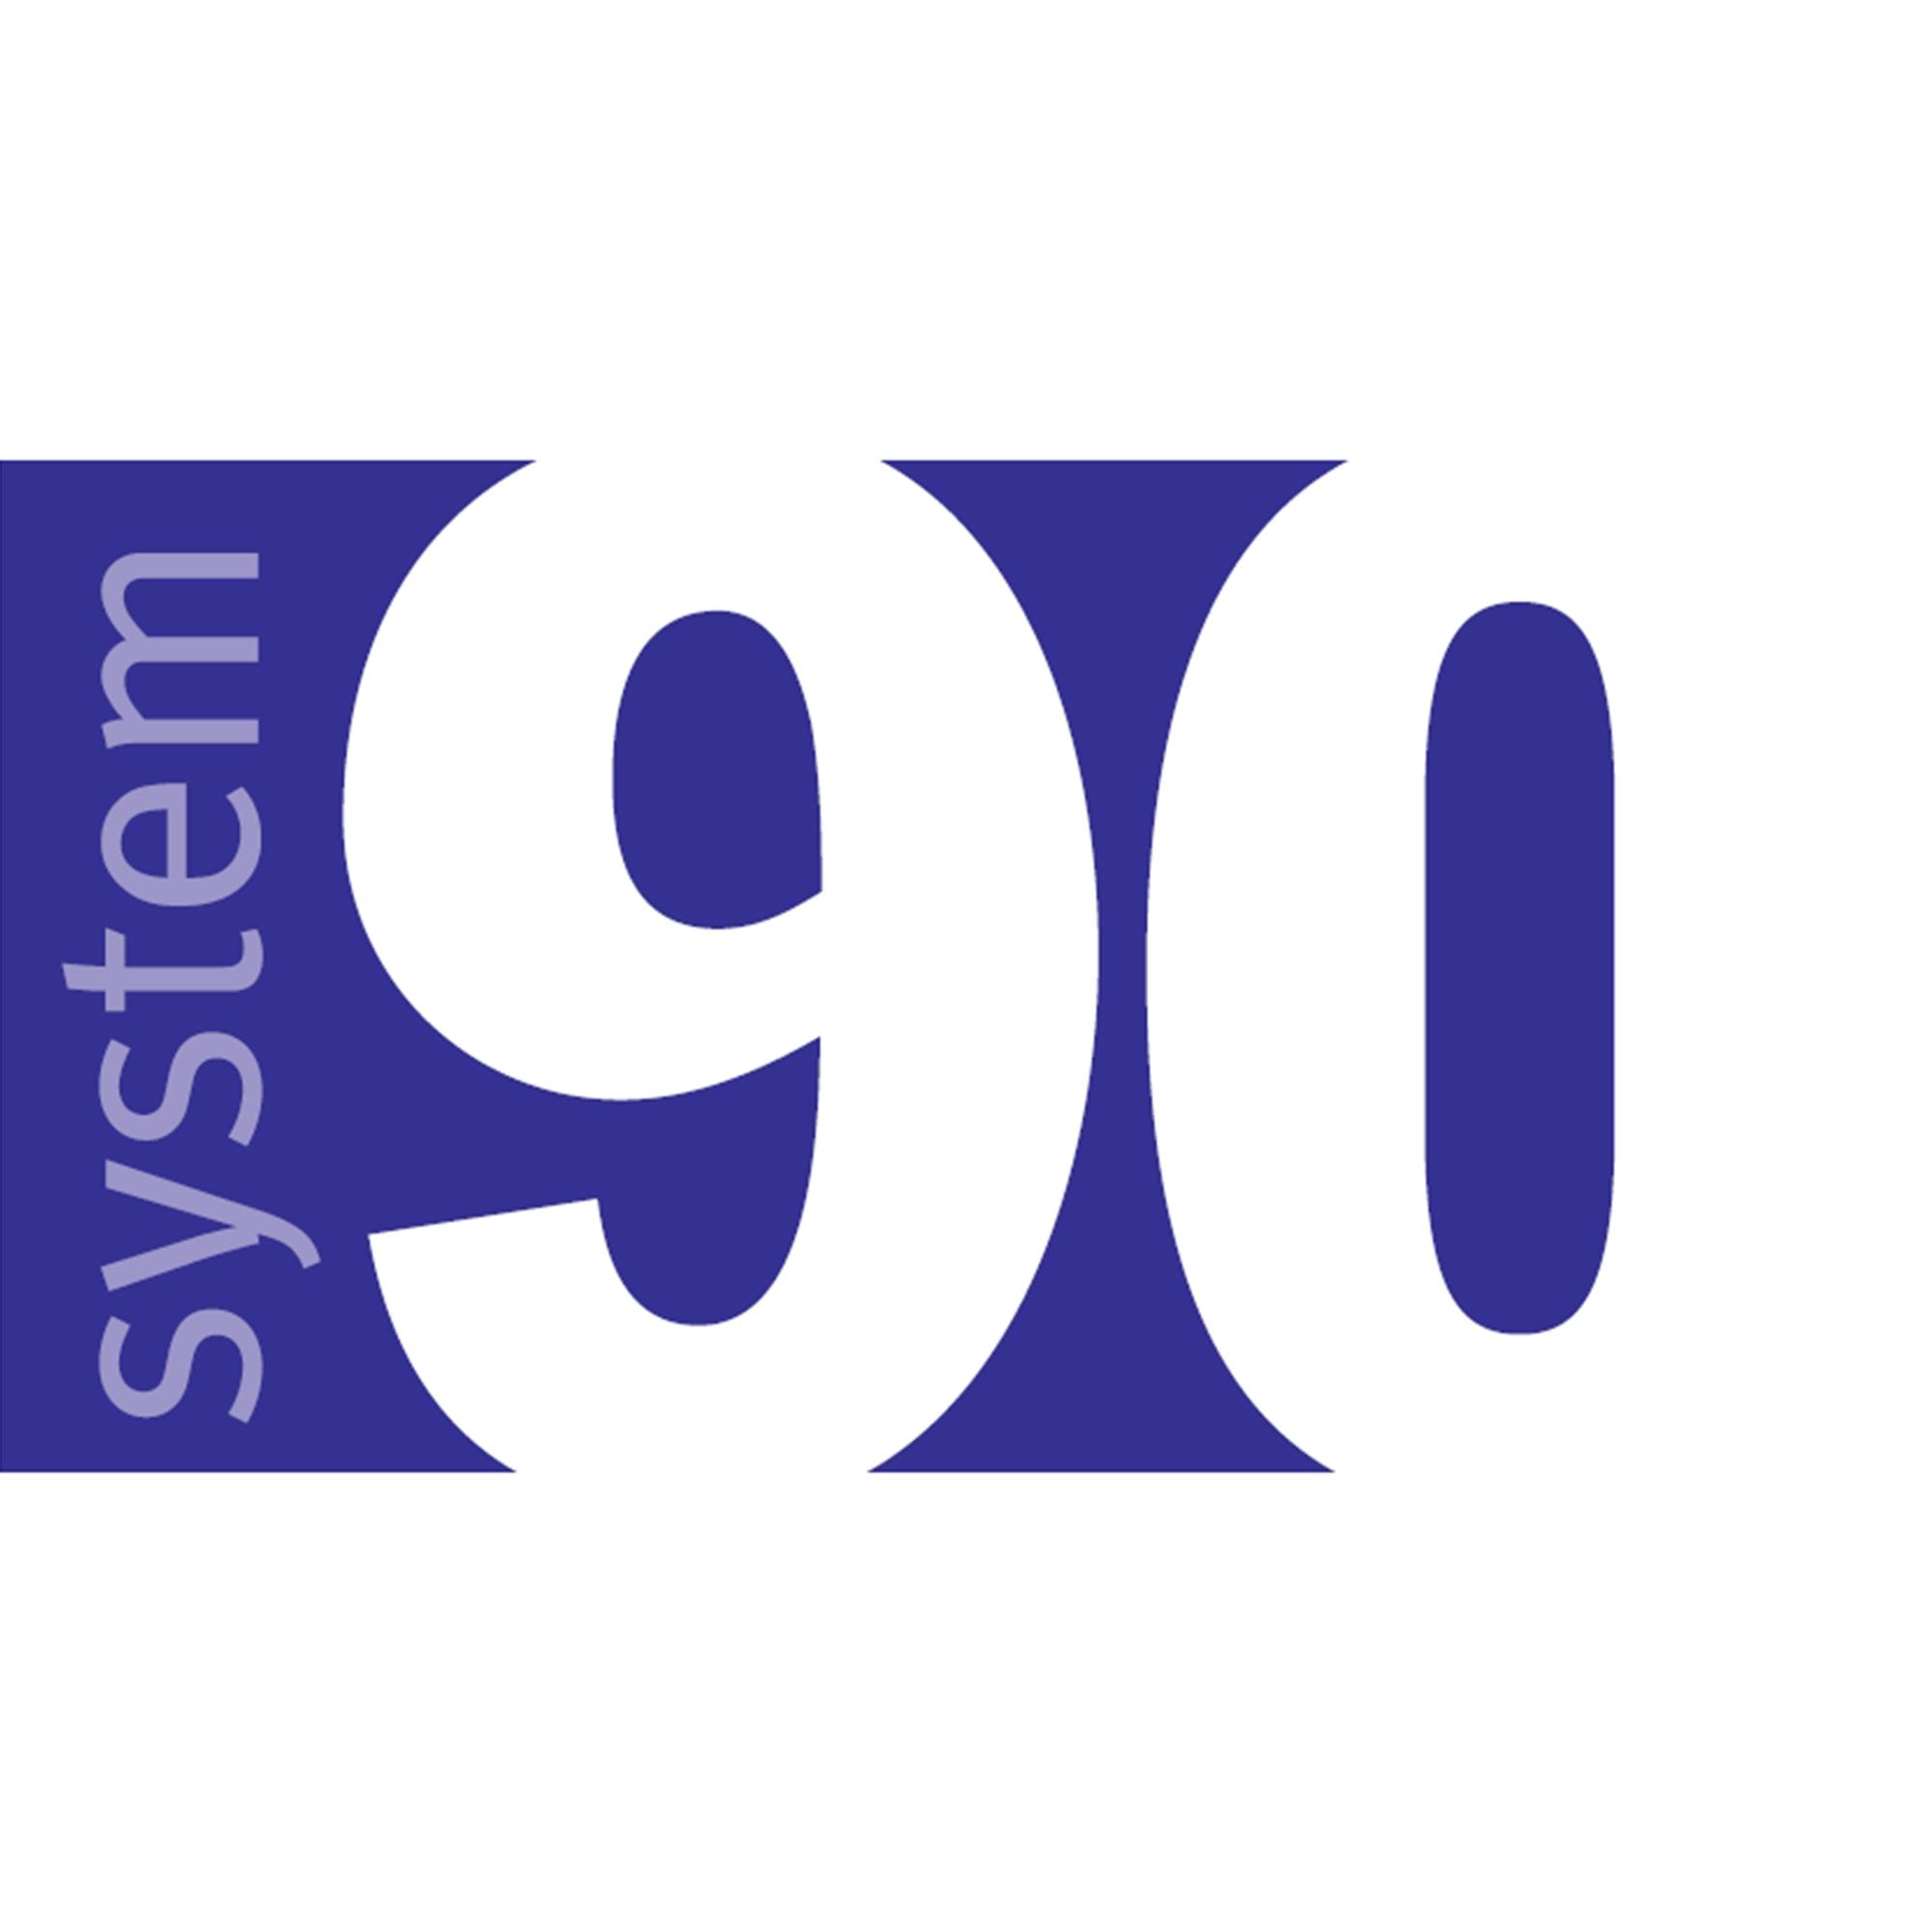 System90